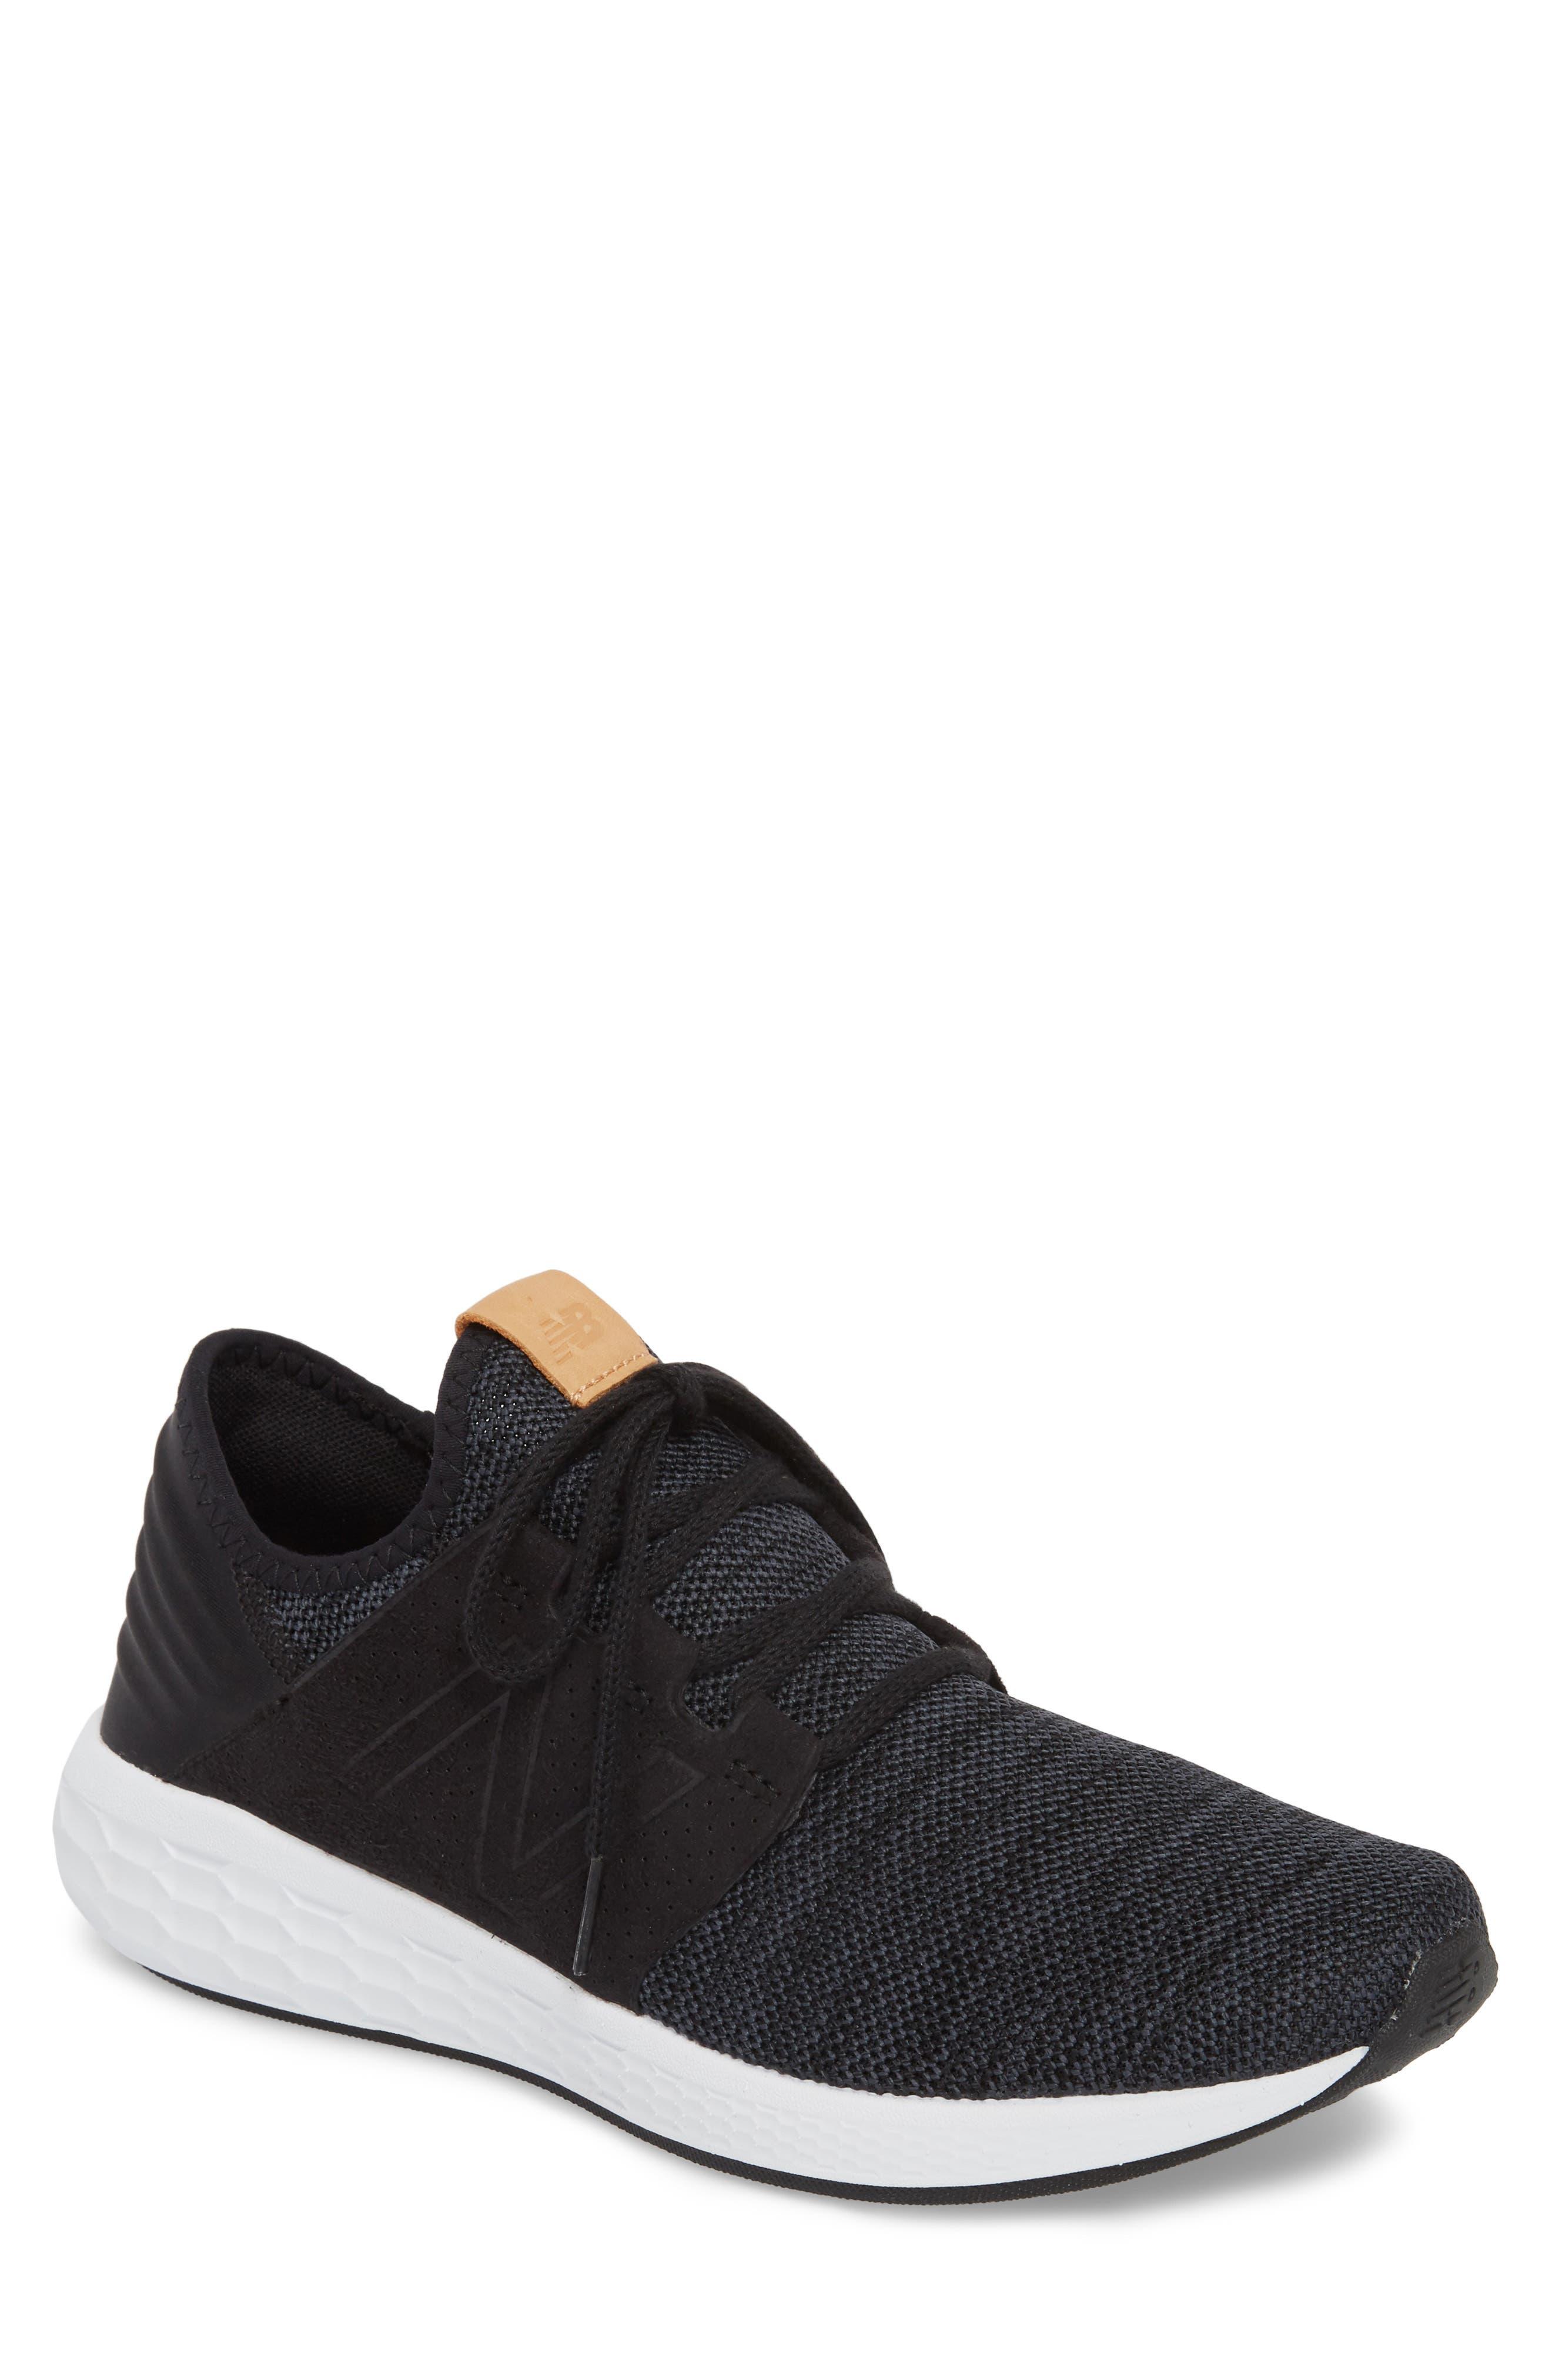 Fresh Foam Cruz v2 Knit Running Shoe,                         Main,                         color, Black/ White